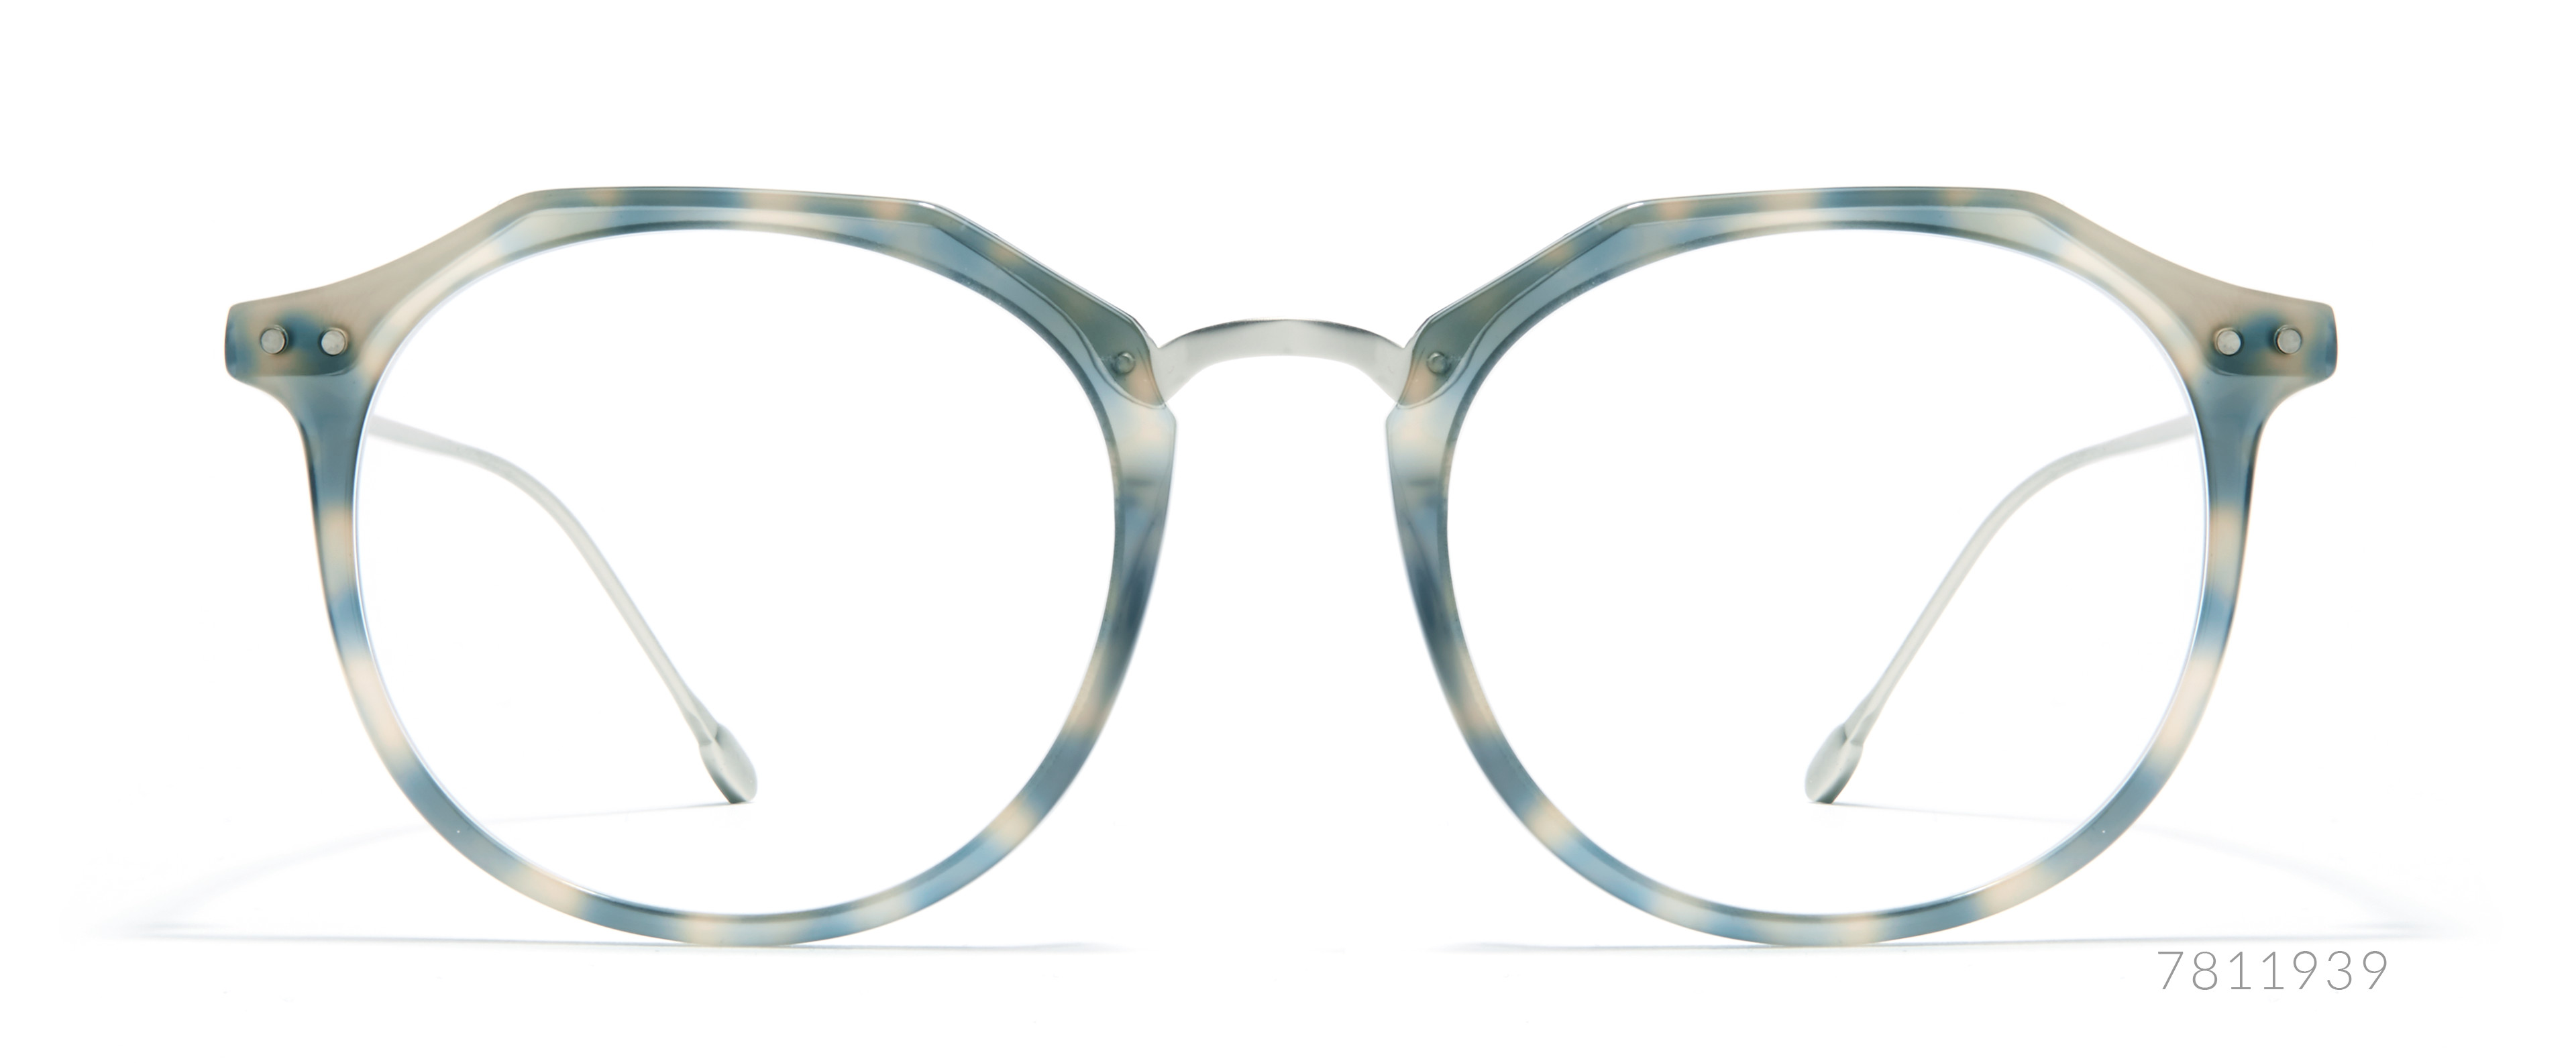 hexagon glasses